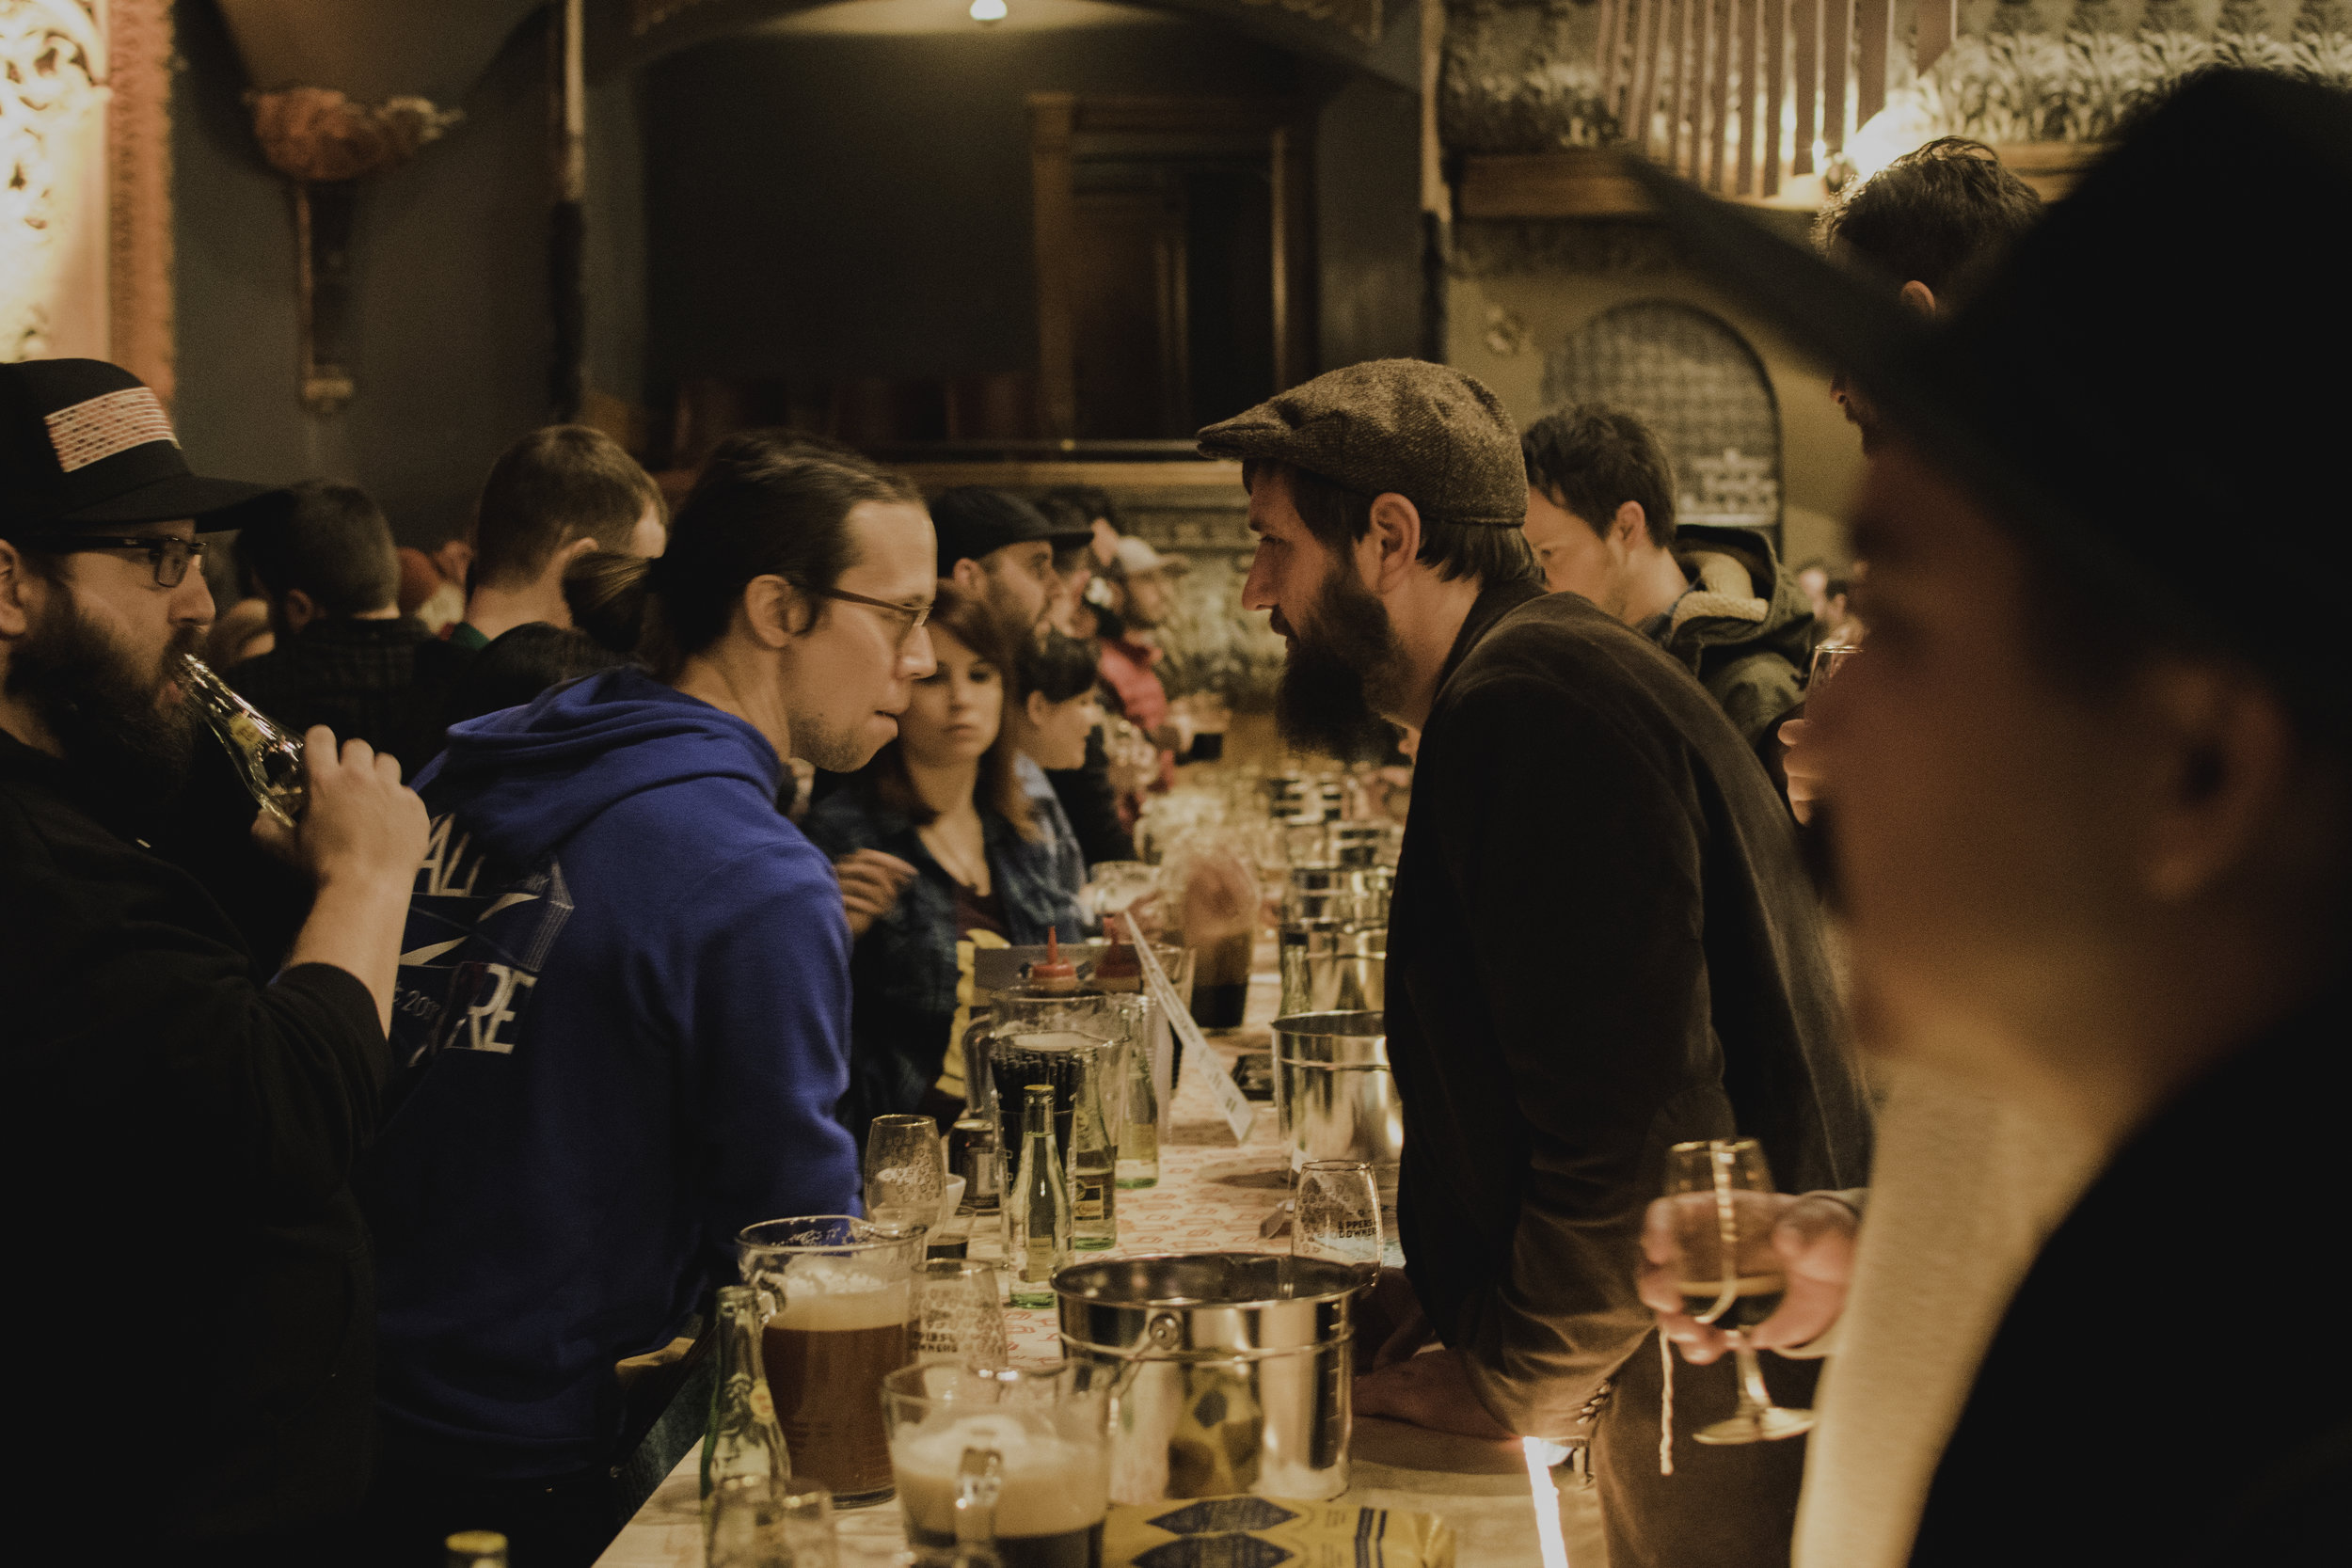 brewers 2.jpg